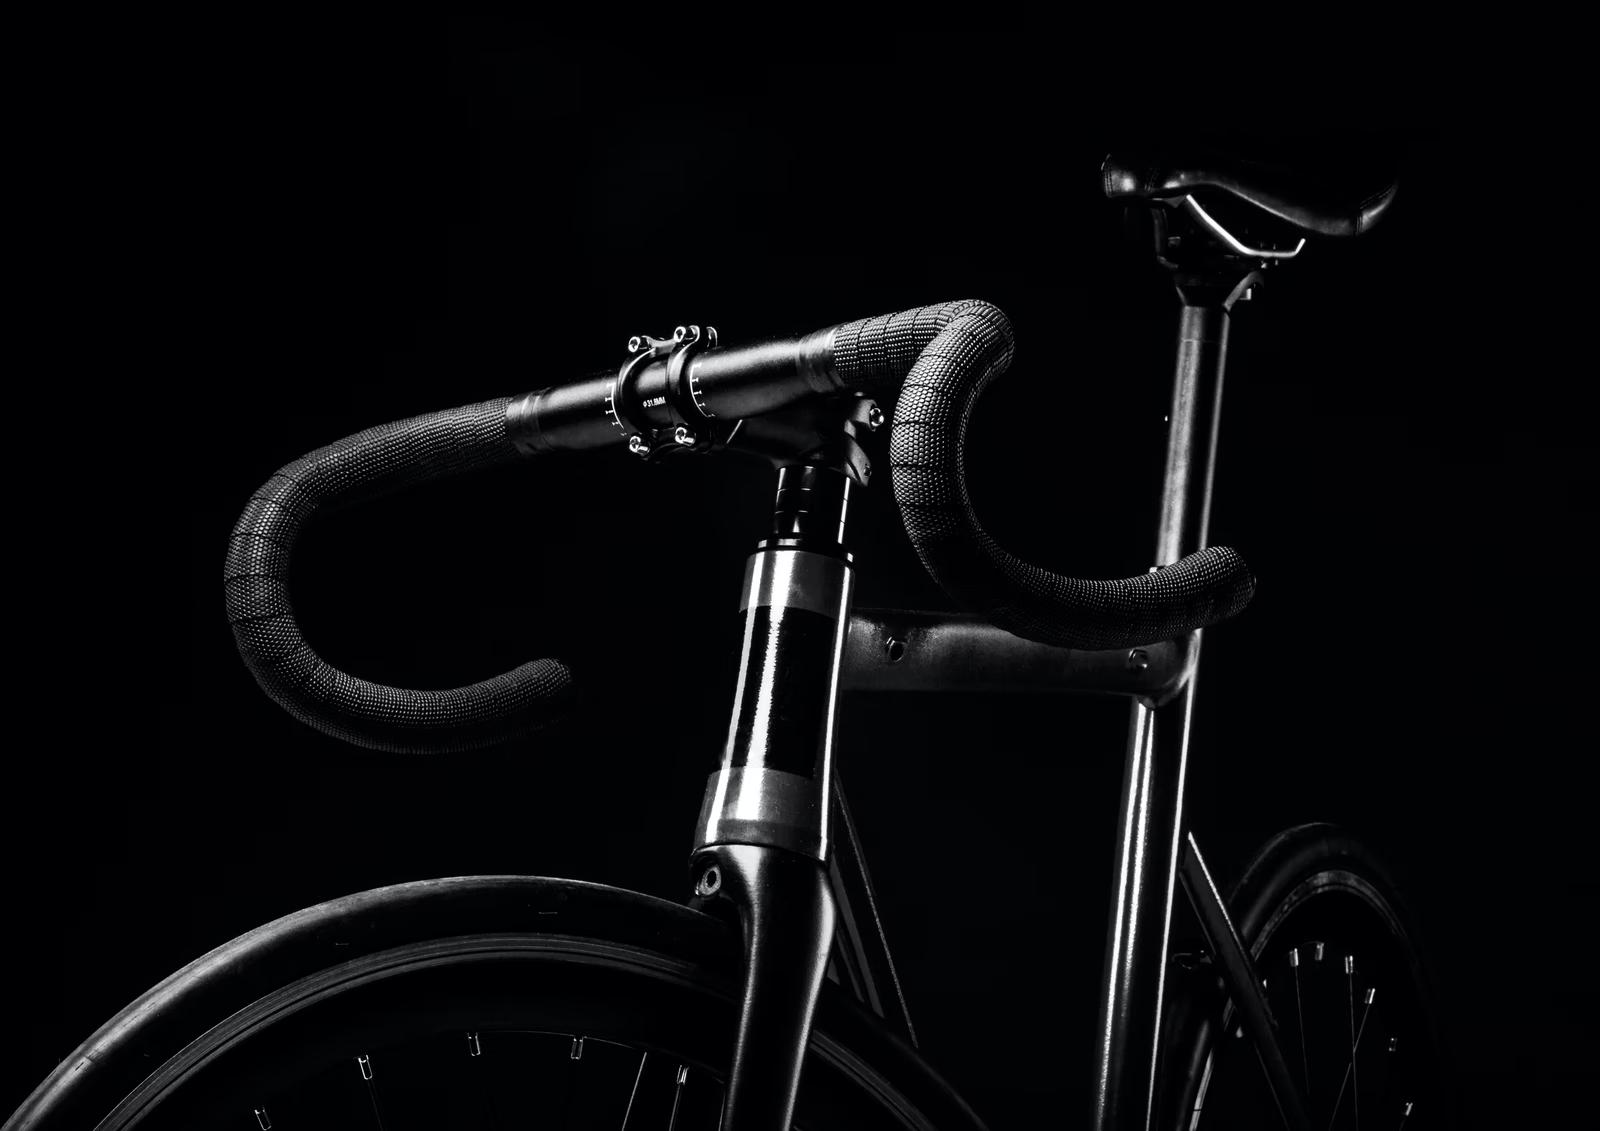 black background - product photography